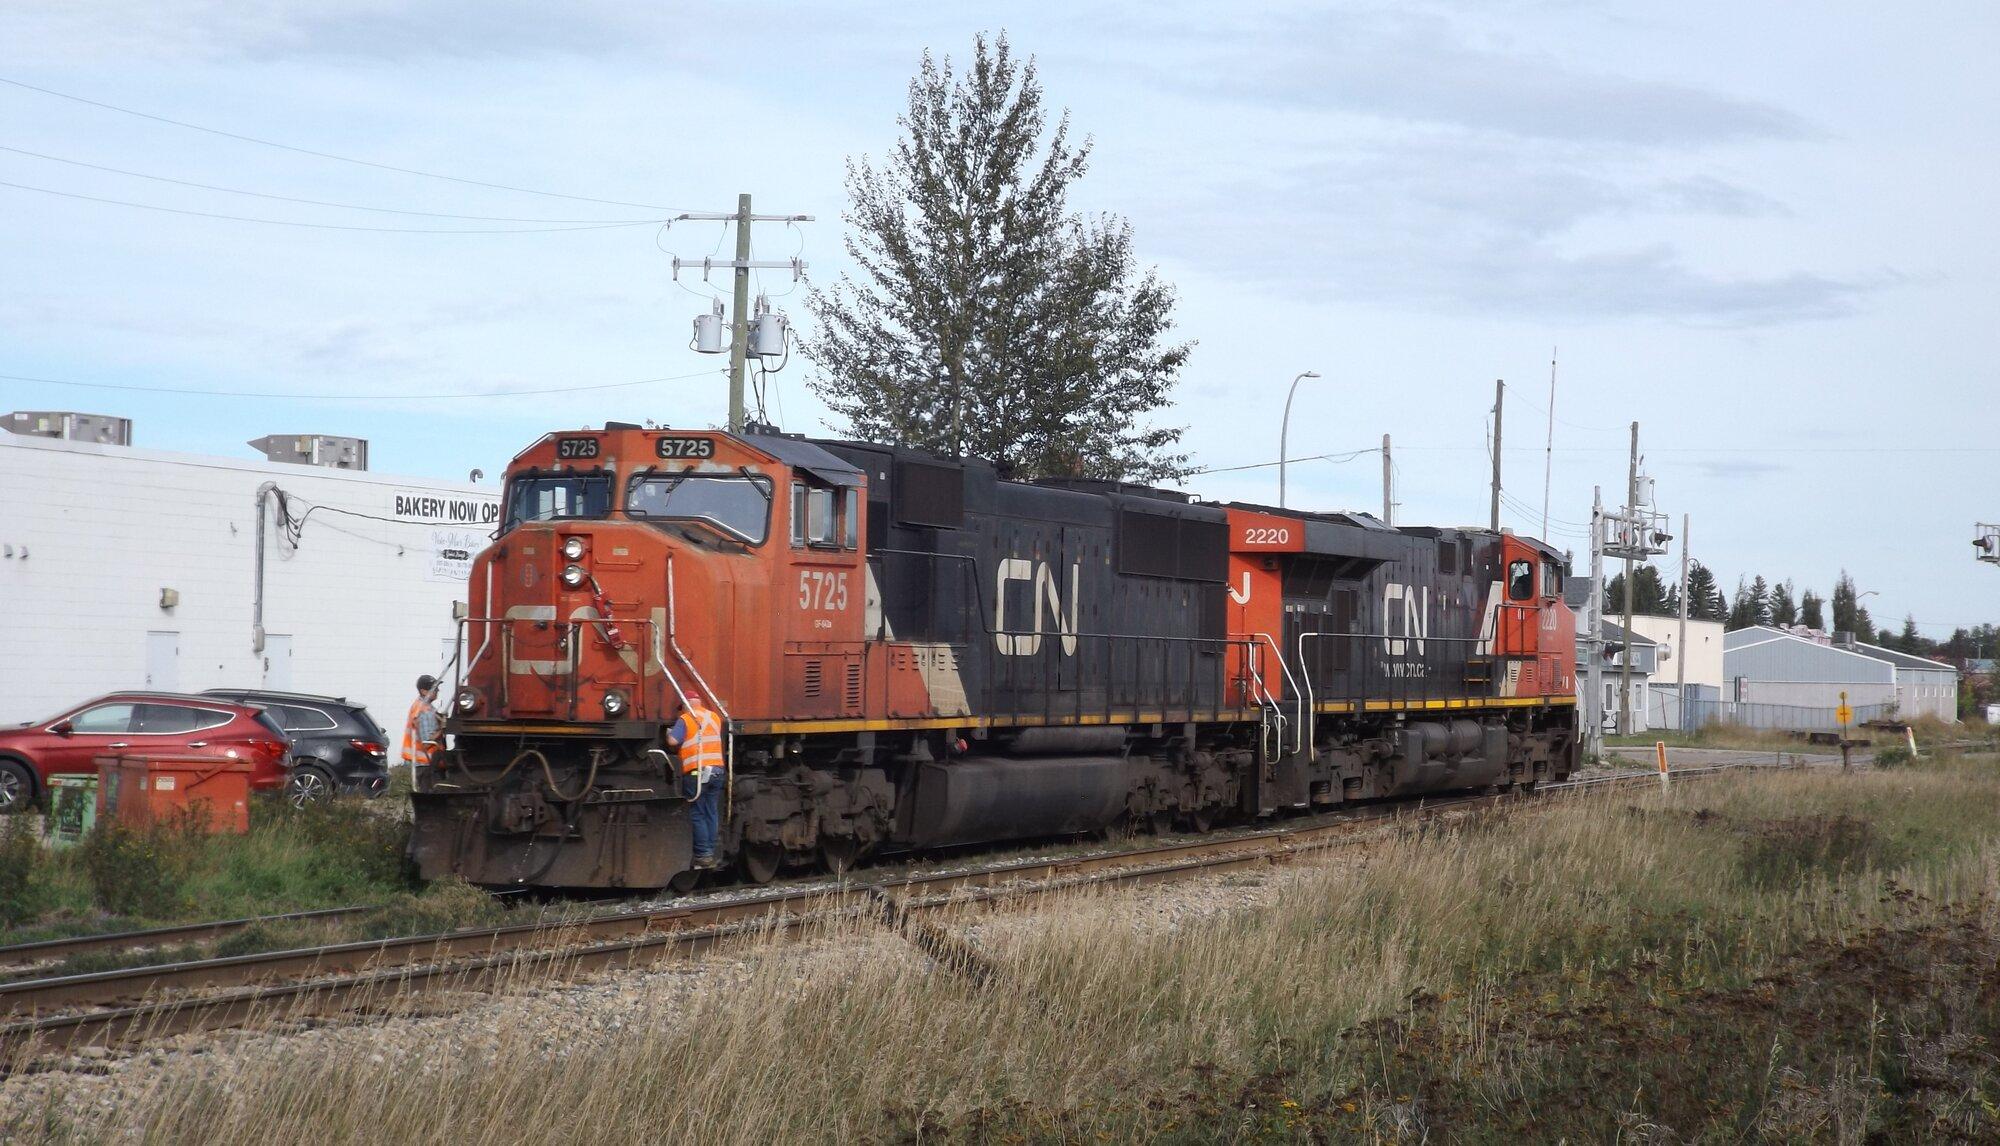 CN 2220 - 5725_09-09-2021 (4) .jpg